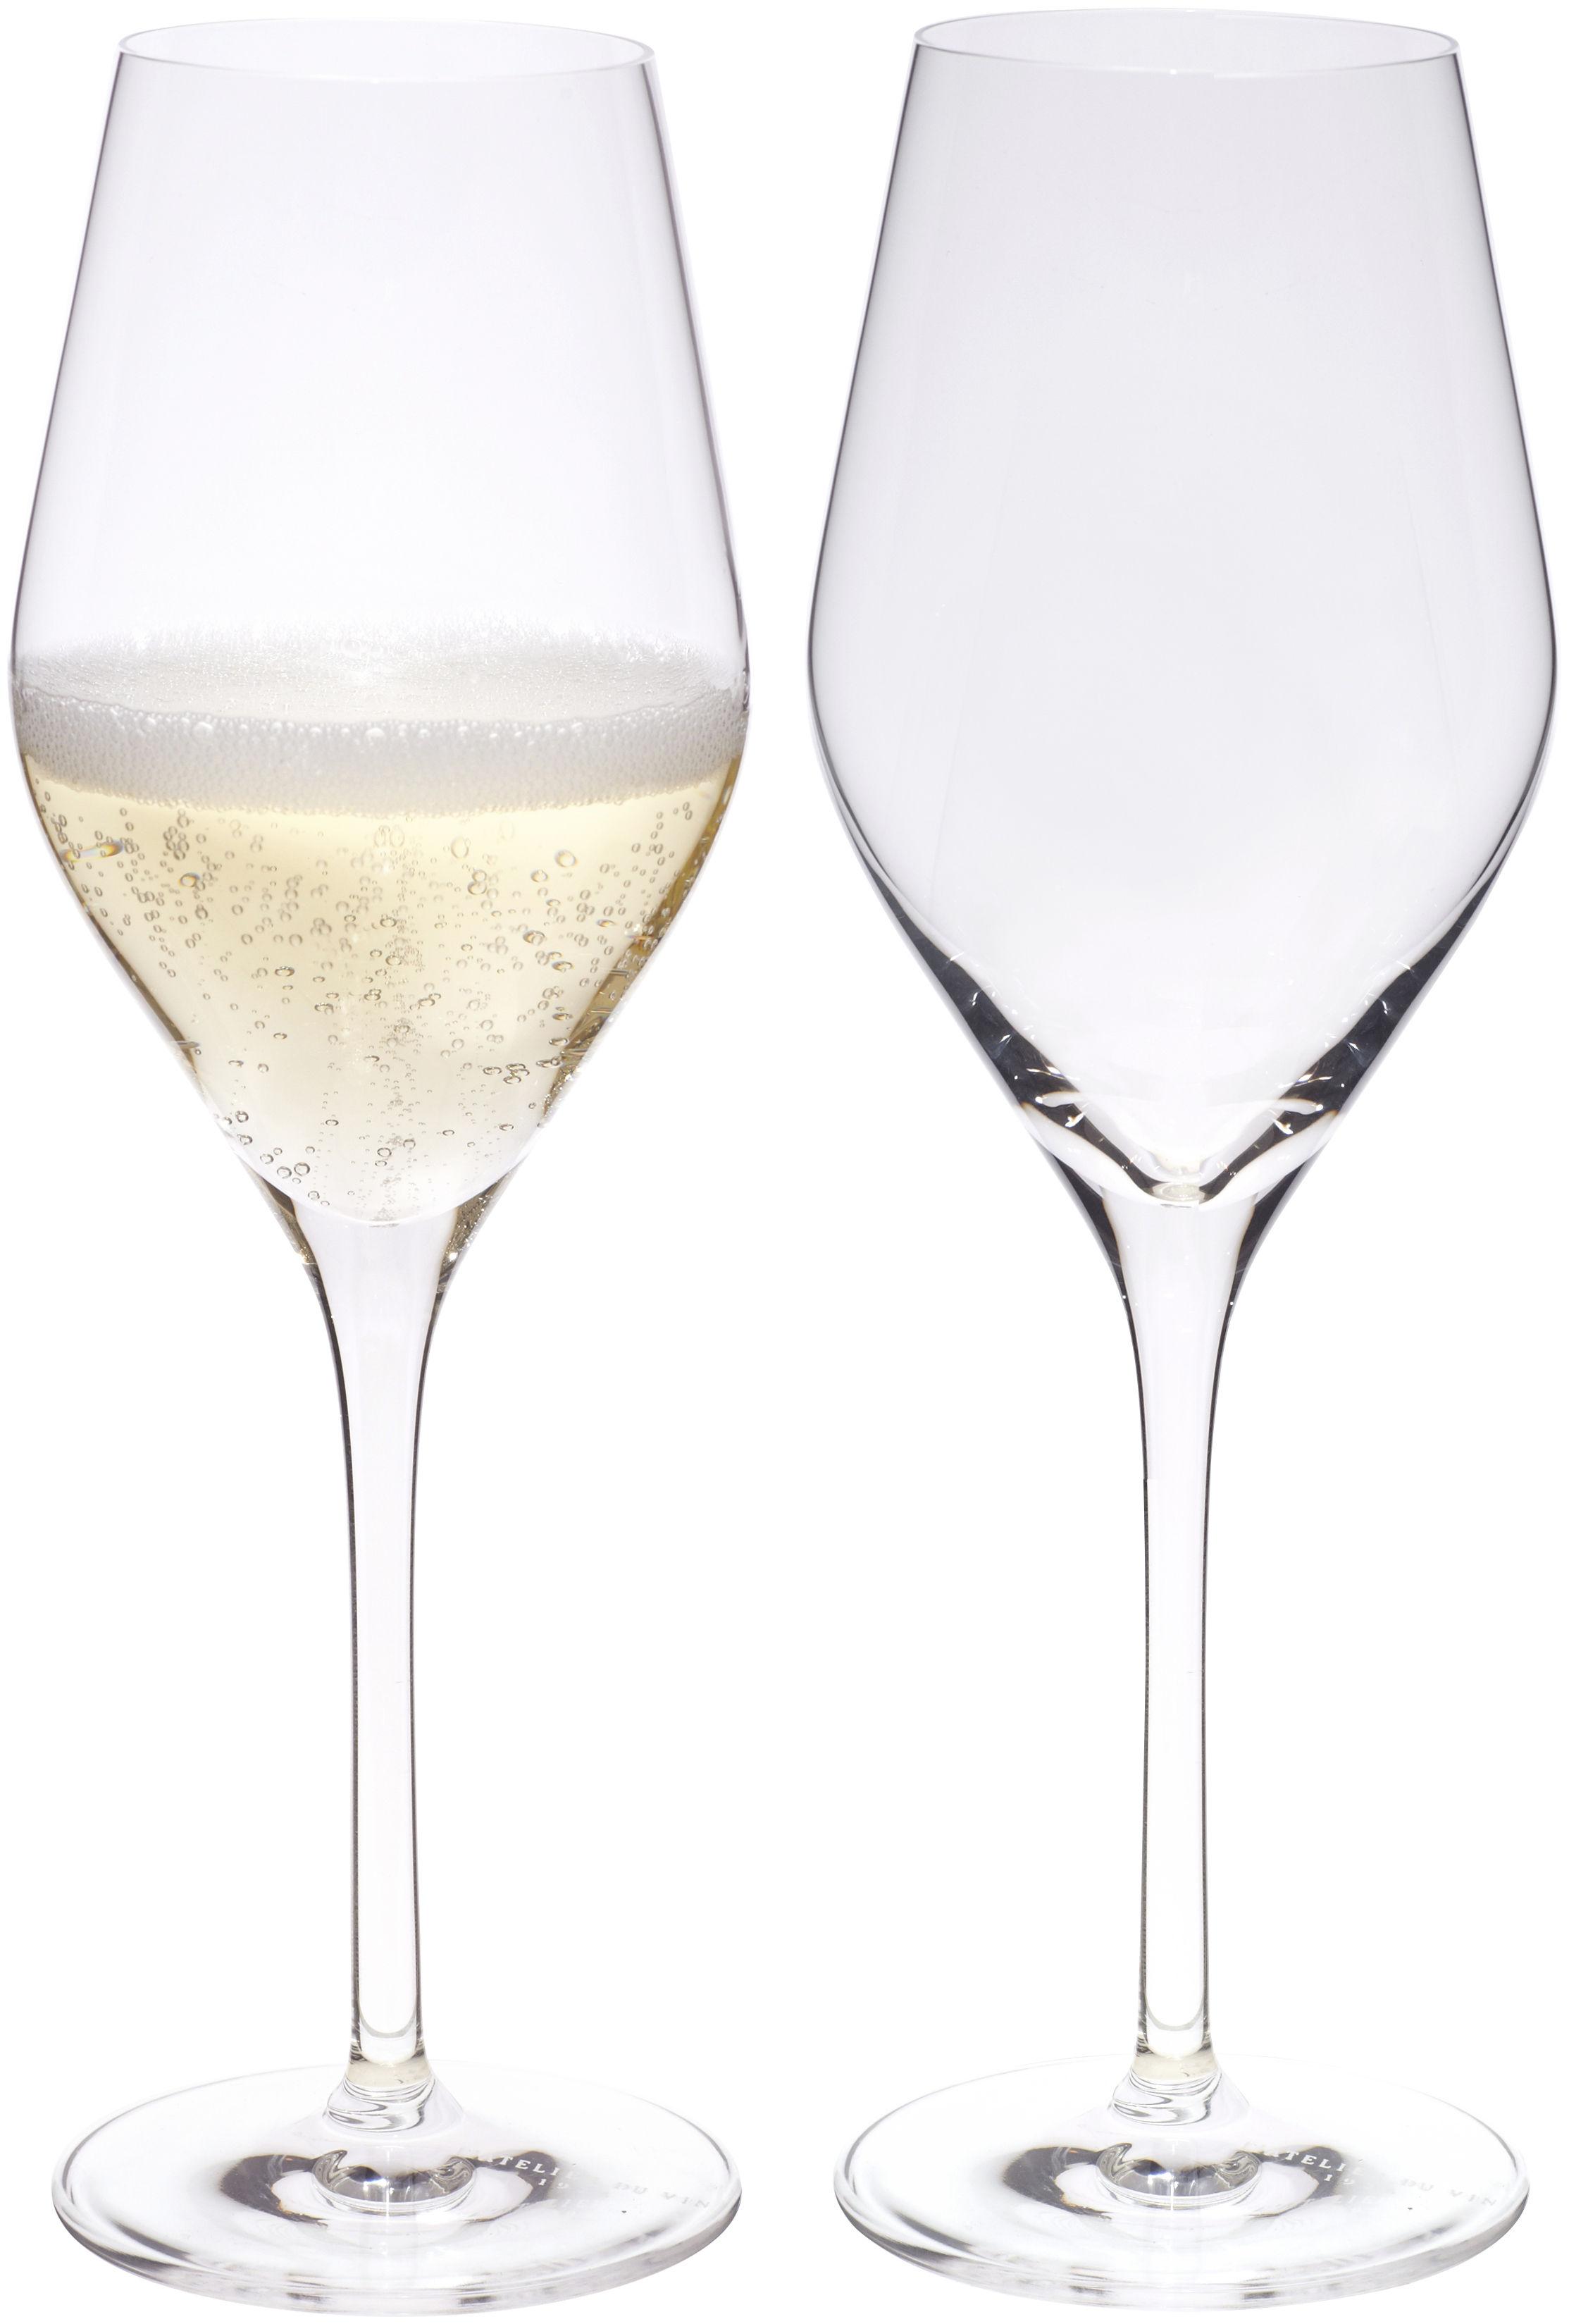 Tavola - Bicchieri  - Flûte da champagne Good Size - / Set da 2 di L'Atelier du Vin - Trasparente -  Nesium®, Verre cristallin soufflé